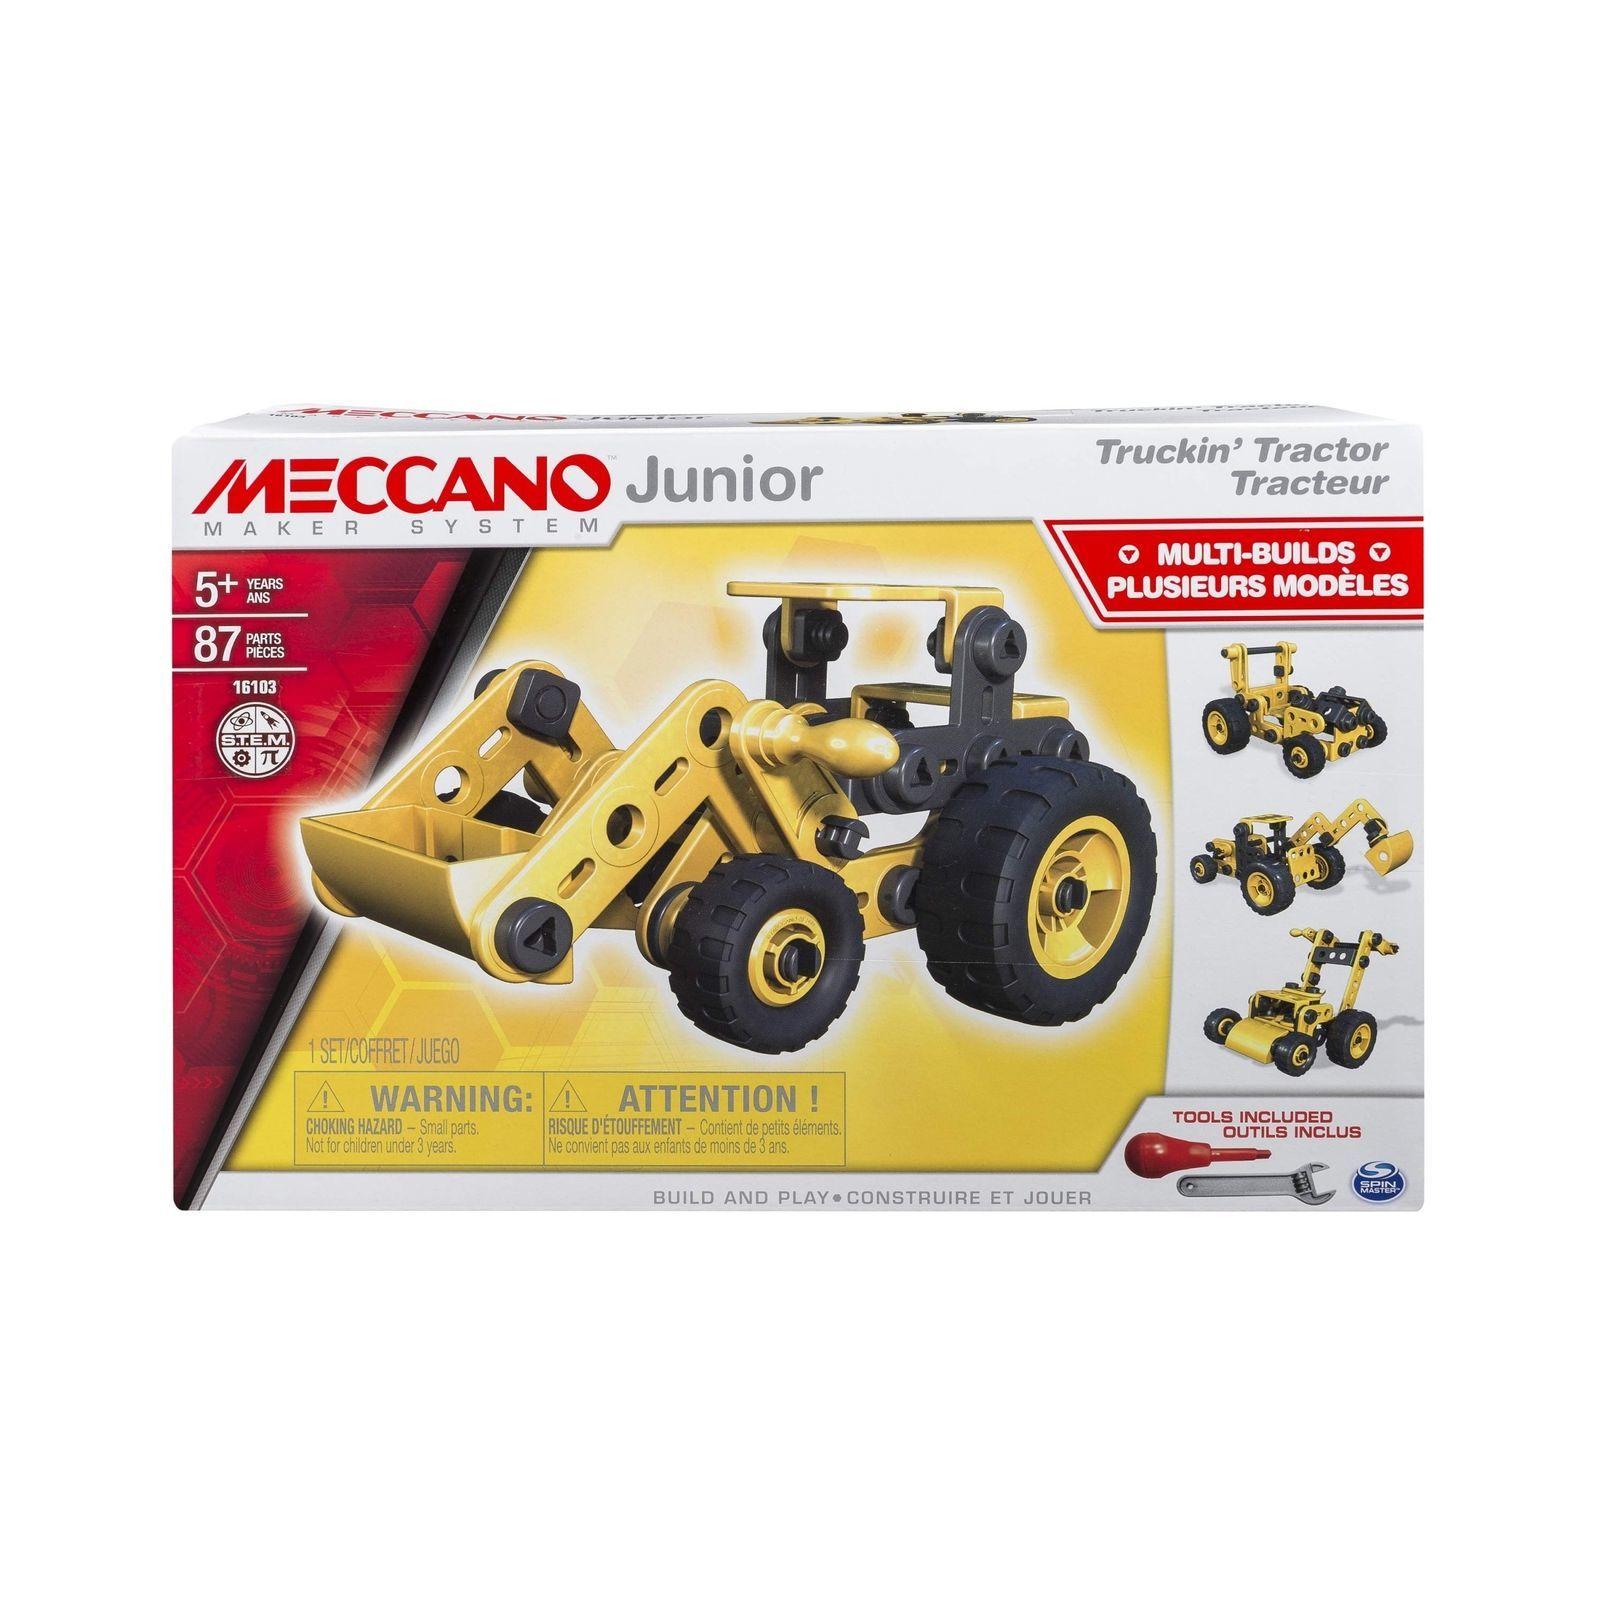 Meccano Junior, Truckin' Tractor, 4 Model Building Set, 87 Pieces [New]